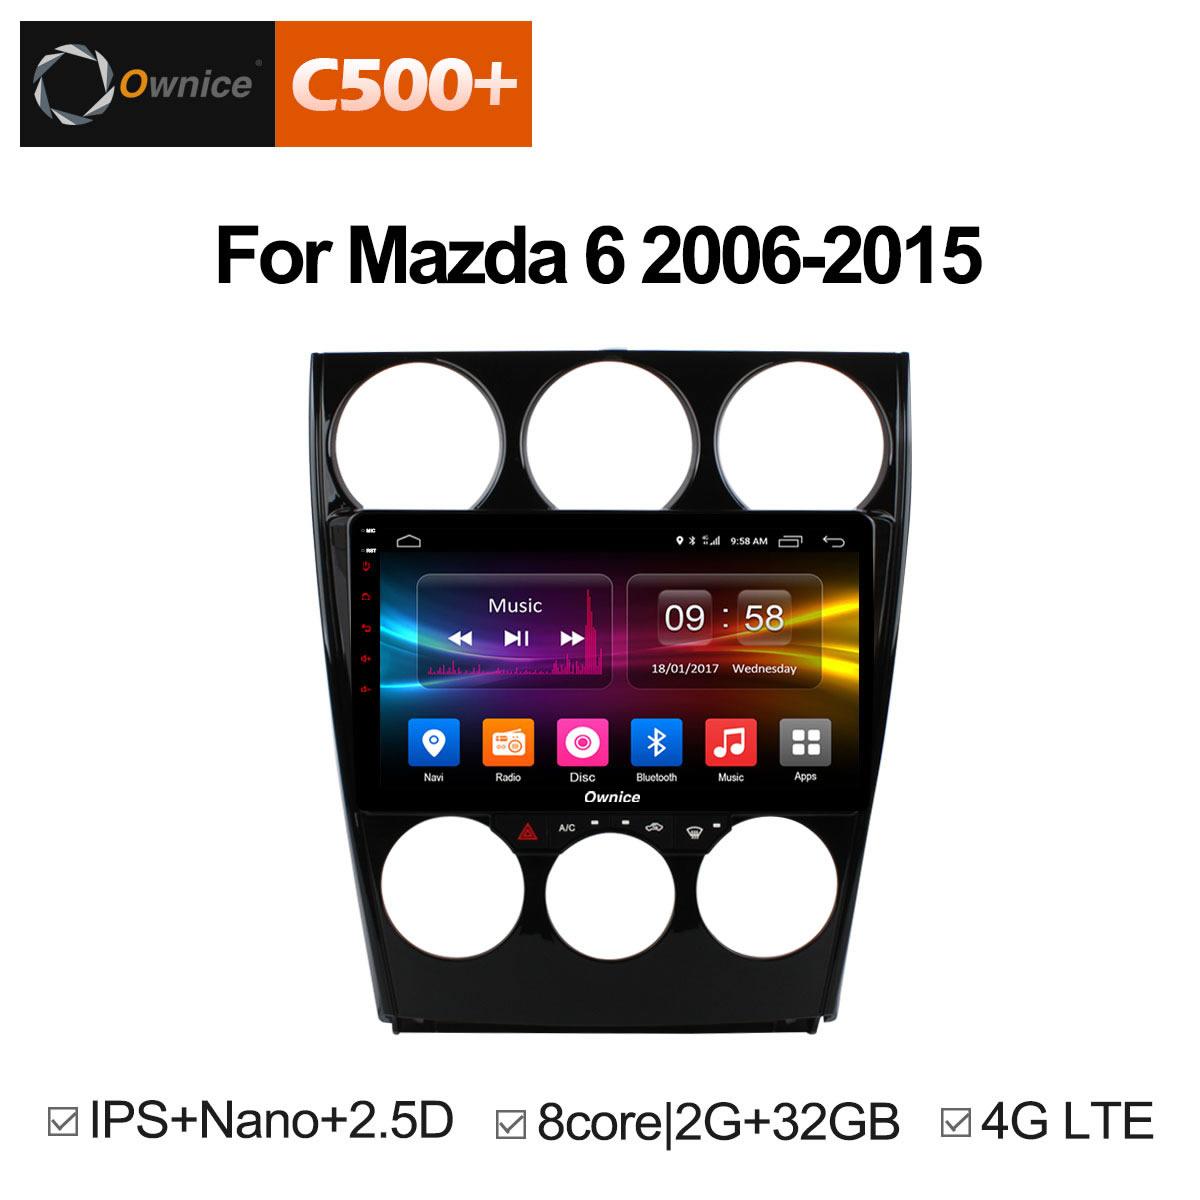 Штатная магнитола CARMEDIA OL-9505-8 (C500+) MAZDA 6 2005-2008 штатная магнитола carmedia ol 1501 dvd mazda cx 5 2011 2016